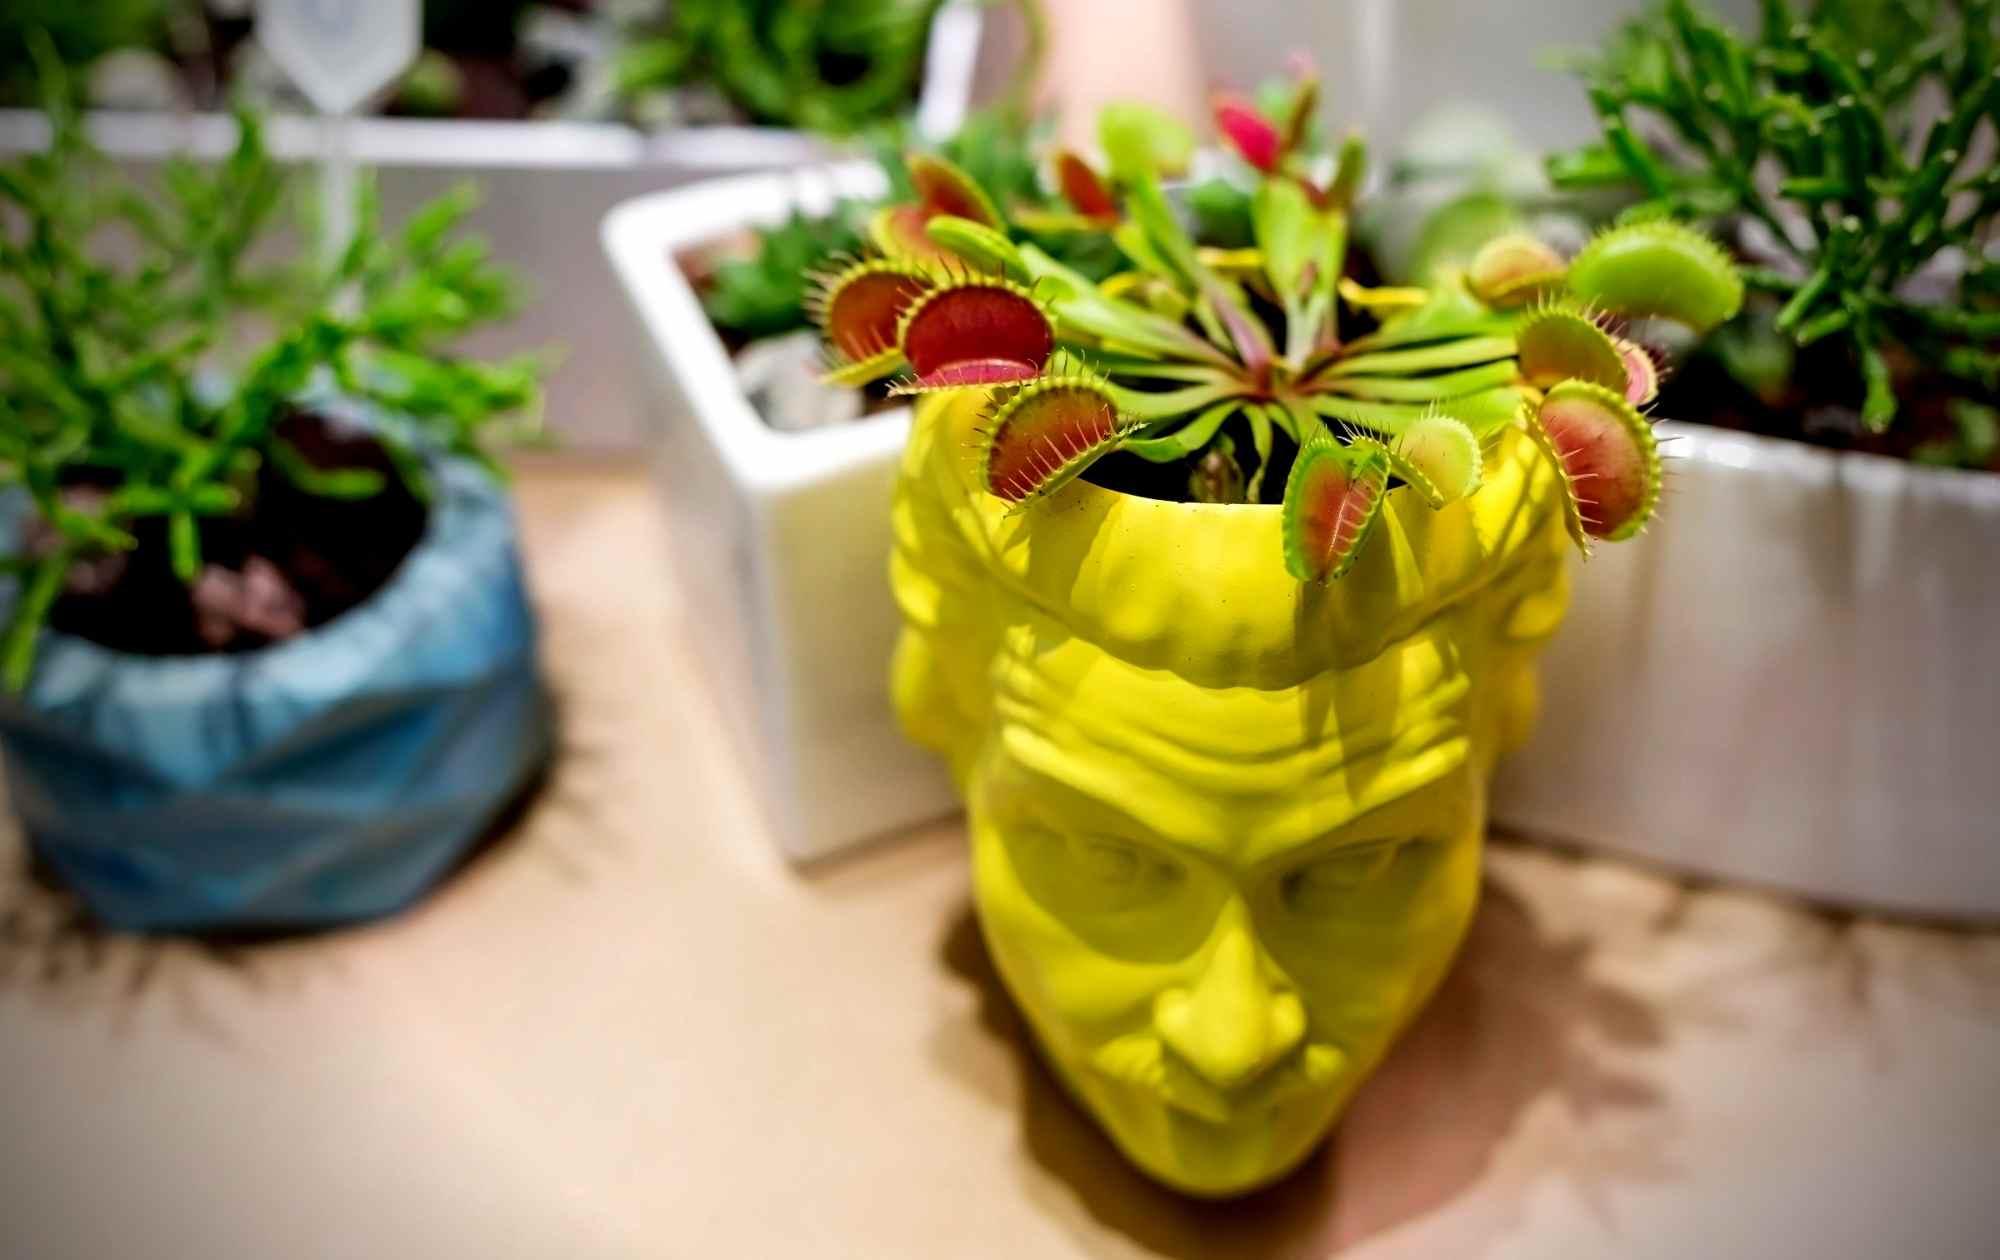 Venus Fly Trap Plant Image